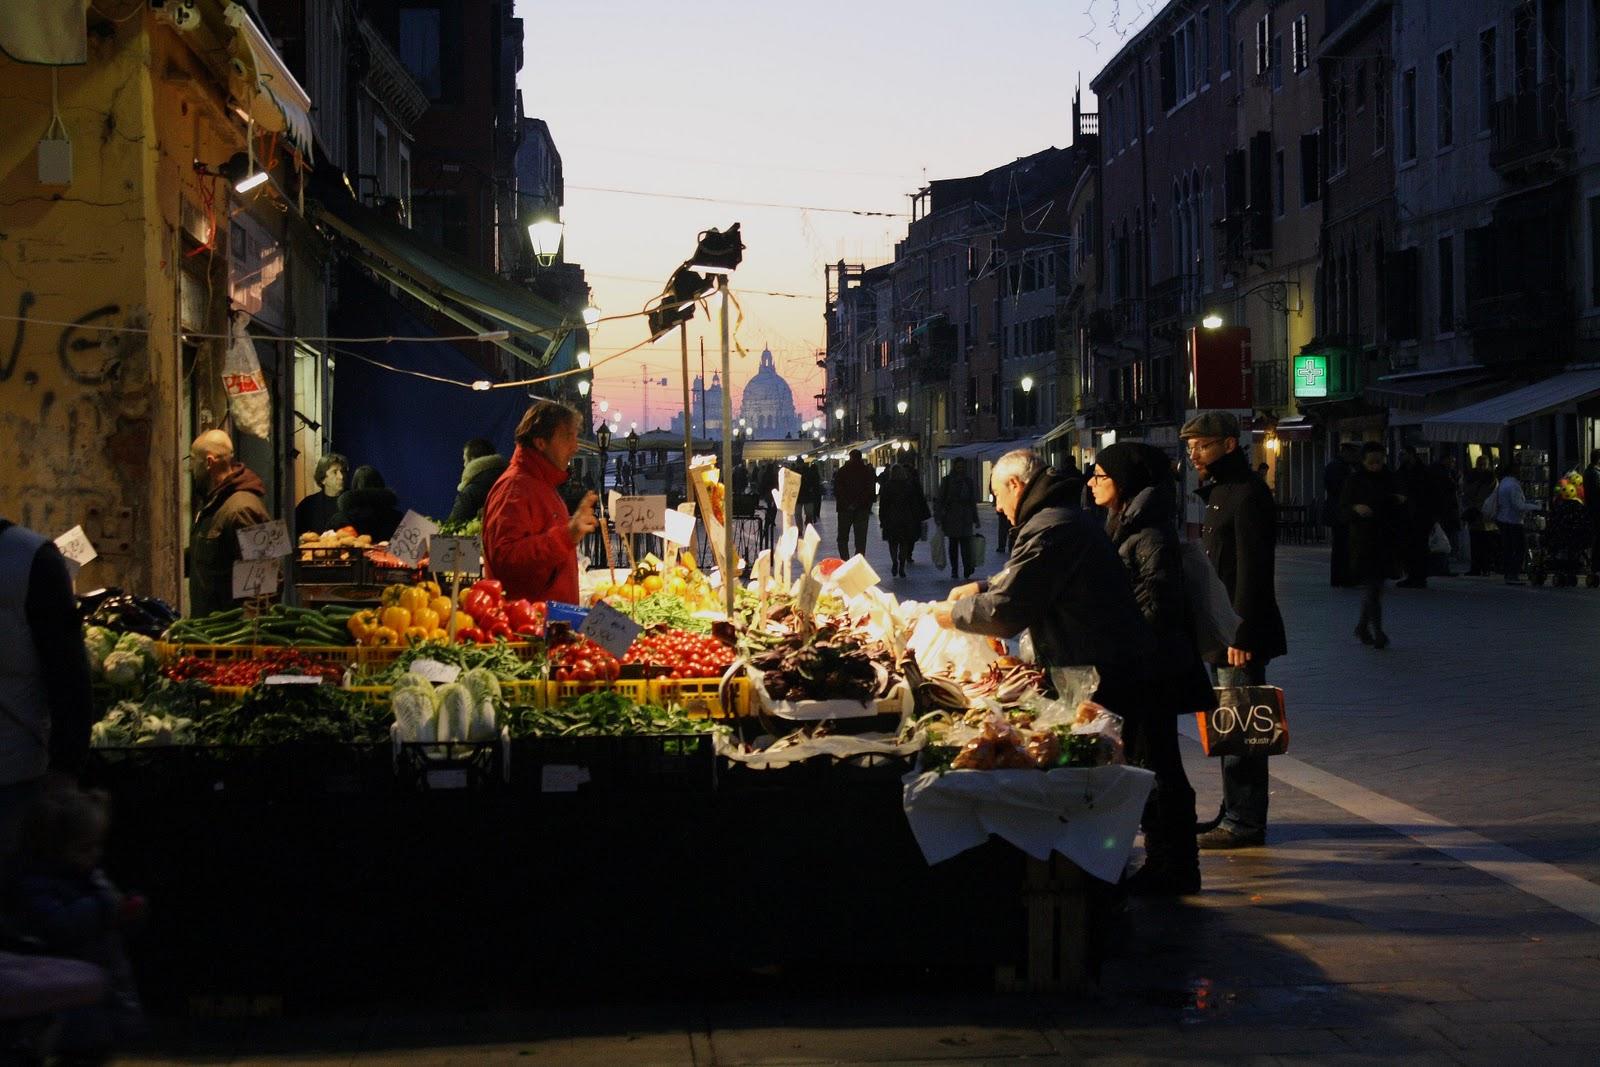 Mercado Via Garibaldi de Venecia